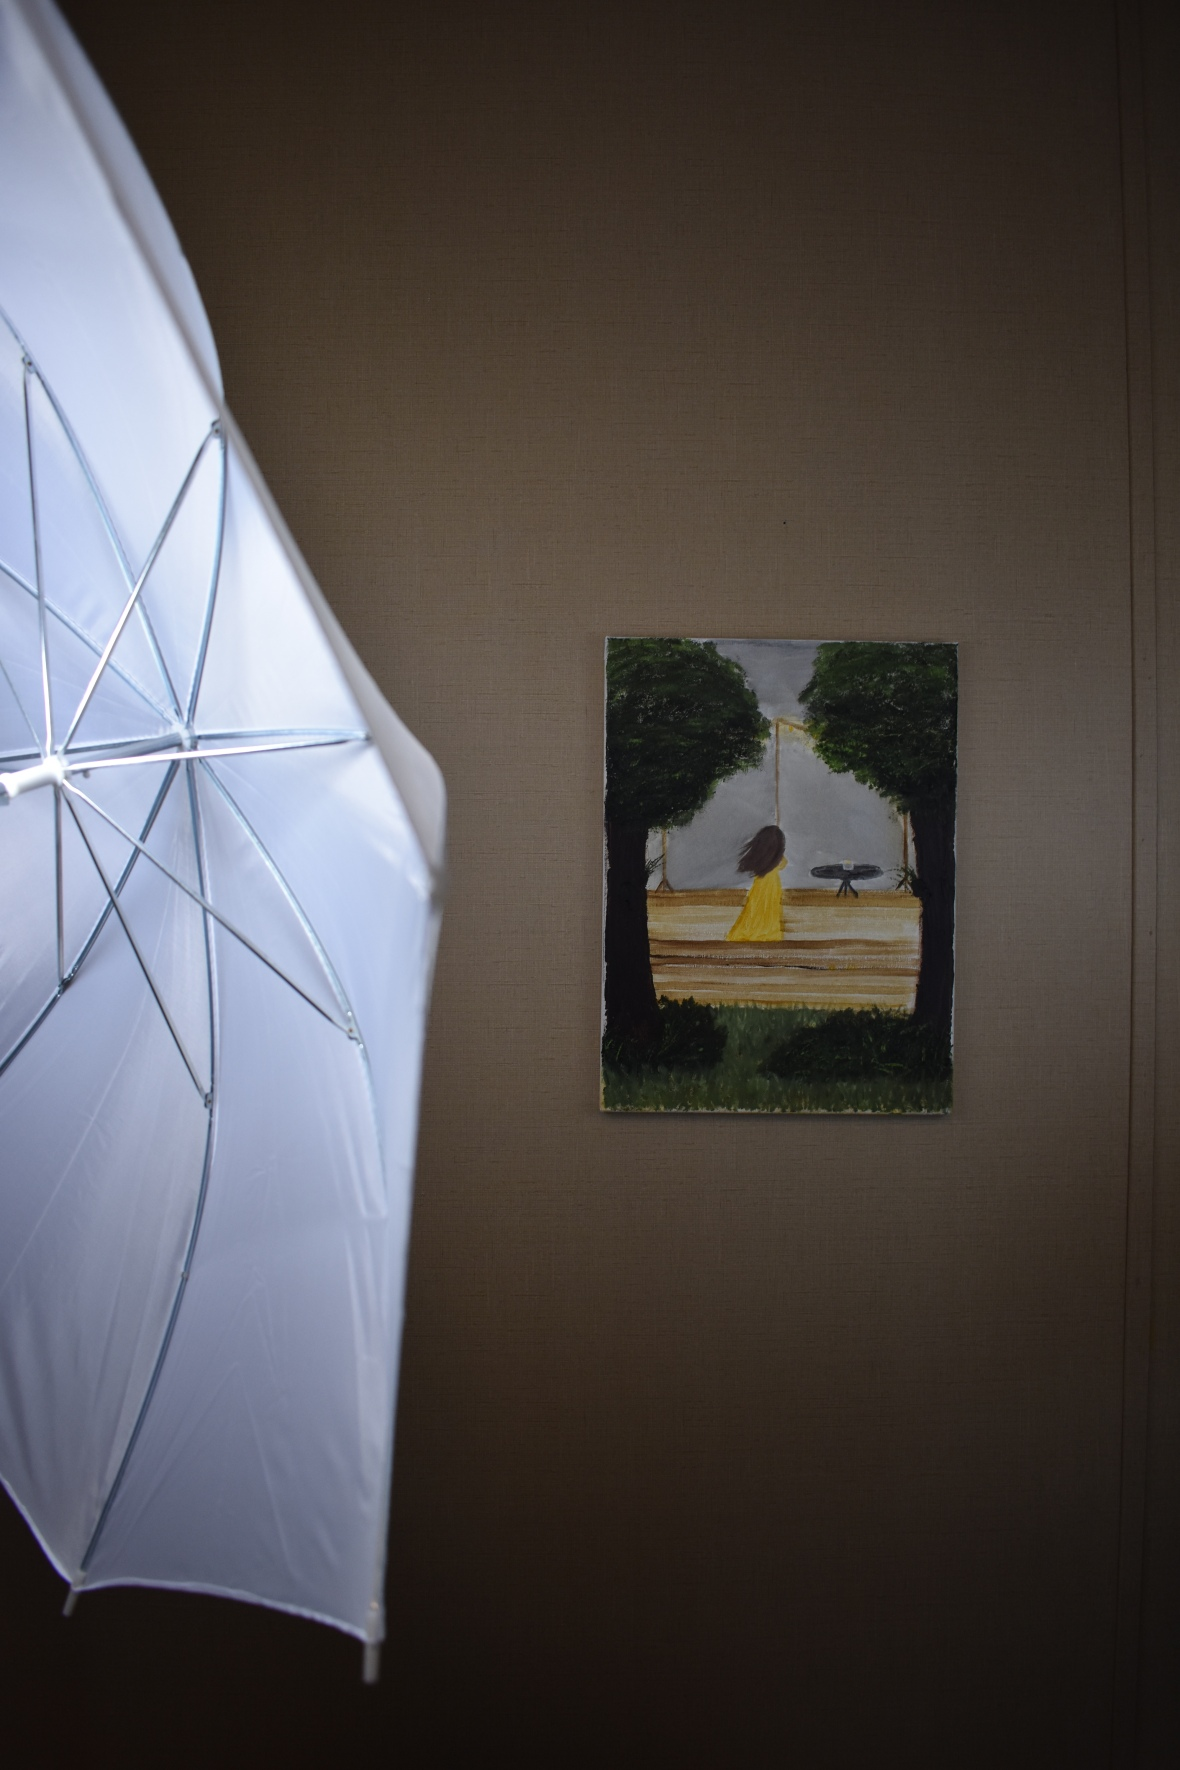 Ponder framed by light